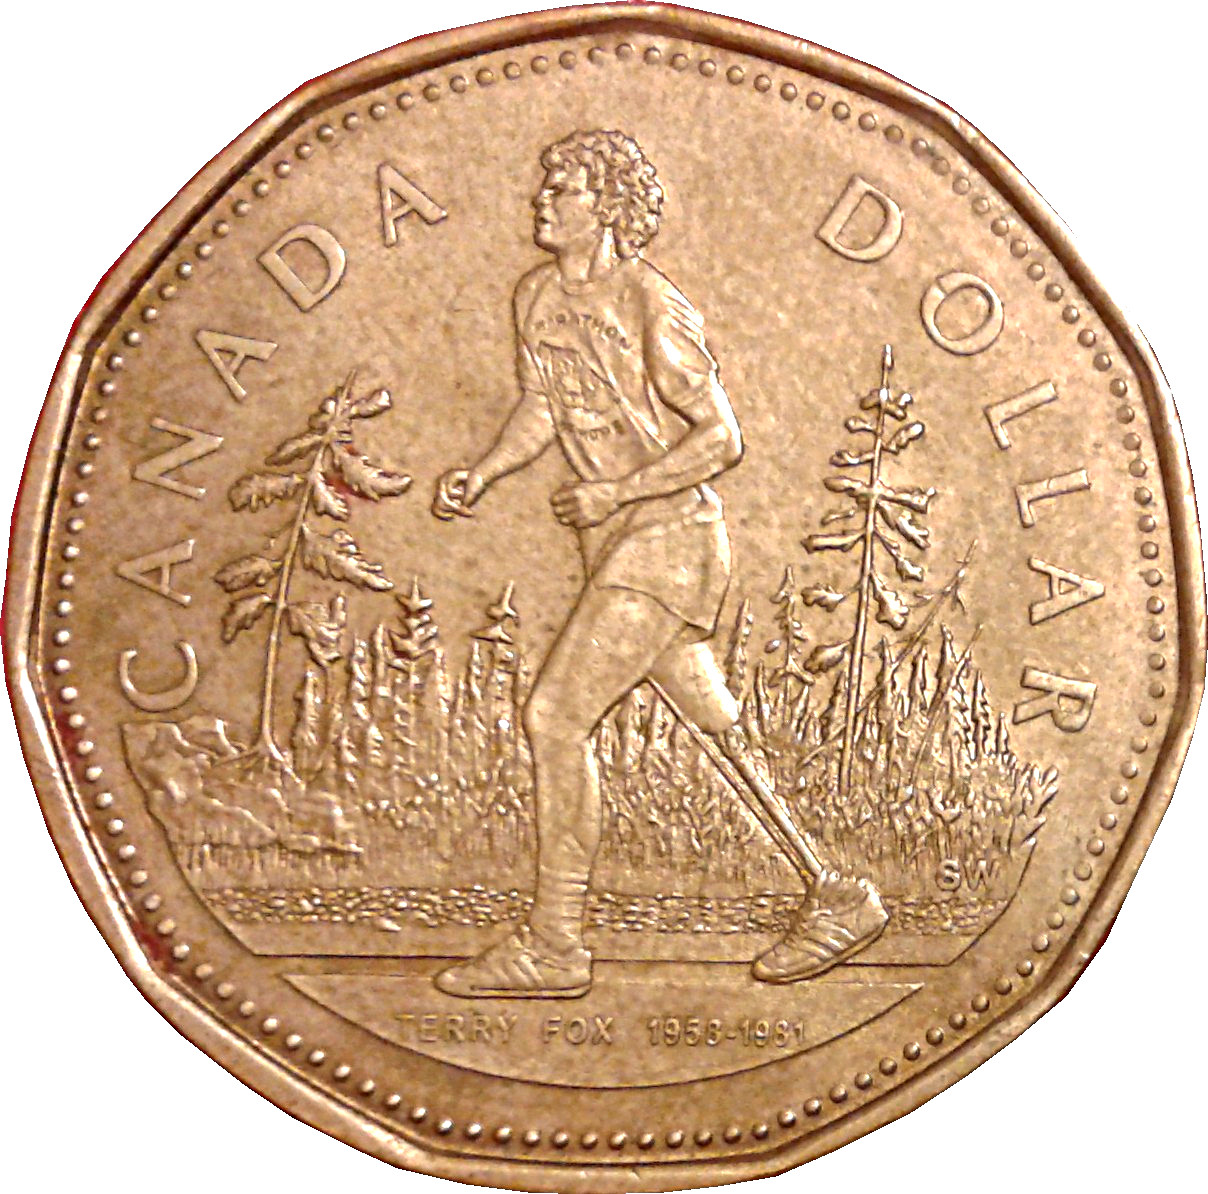 BU UNC Canada 2005 Terry Fox Marathon of Hope Dollar $1 loonie coin